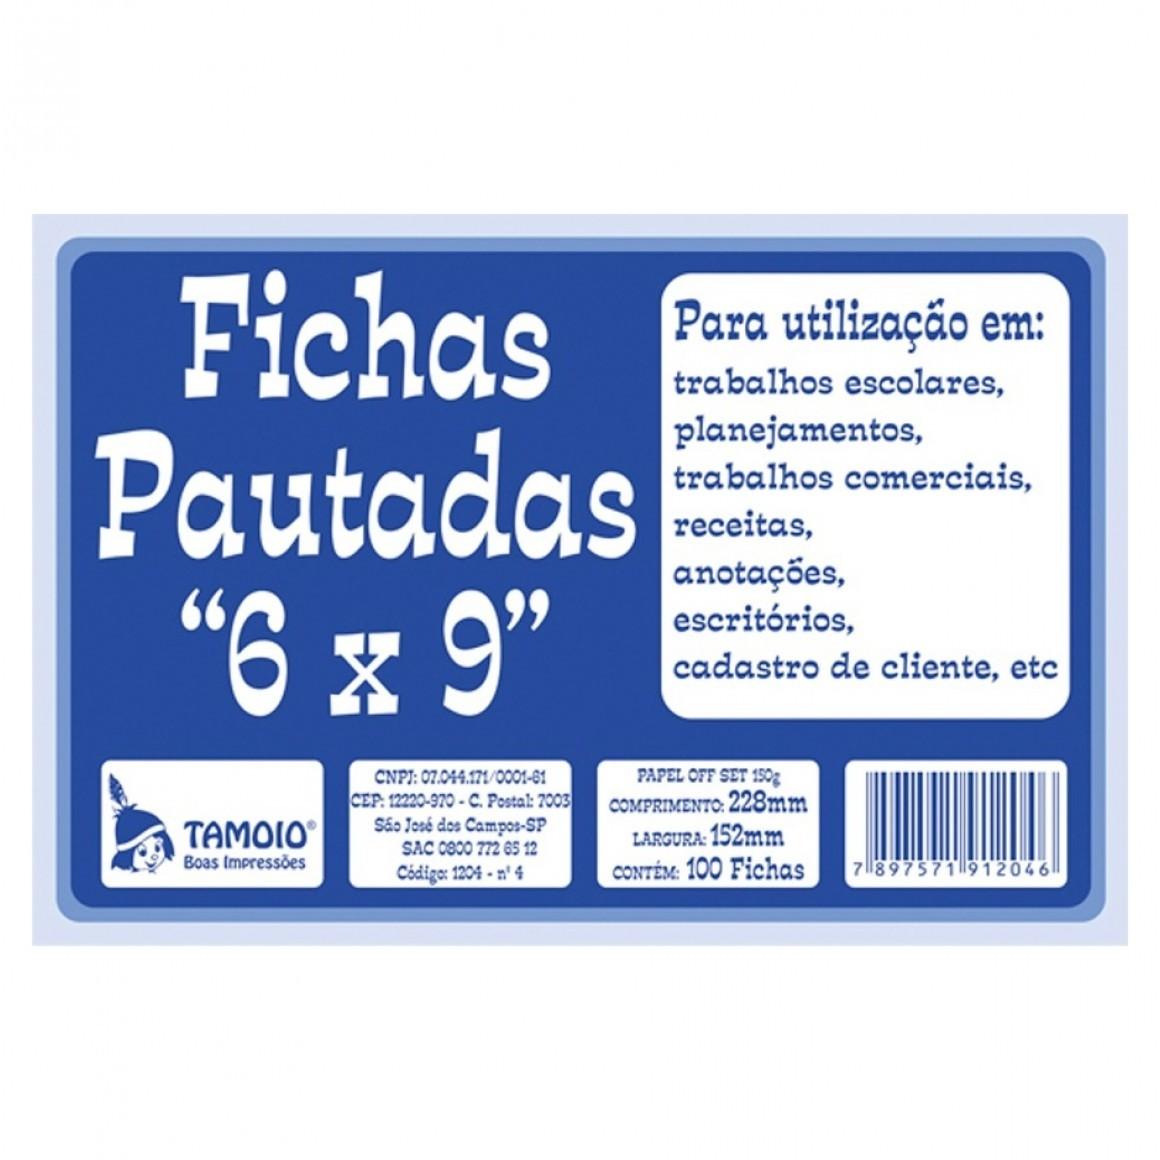 Fichas Pautadas 6x9 - Tamoio